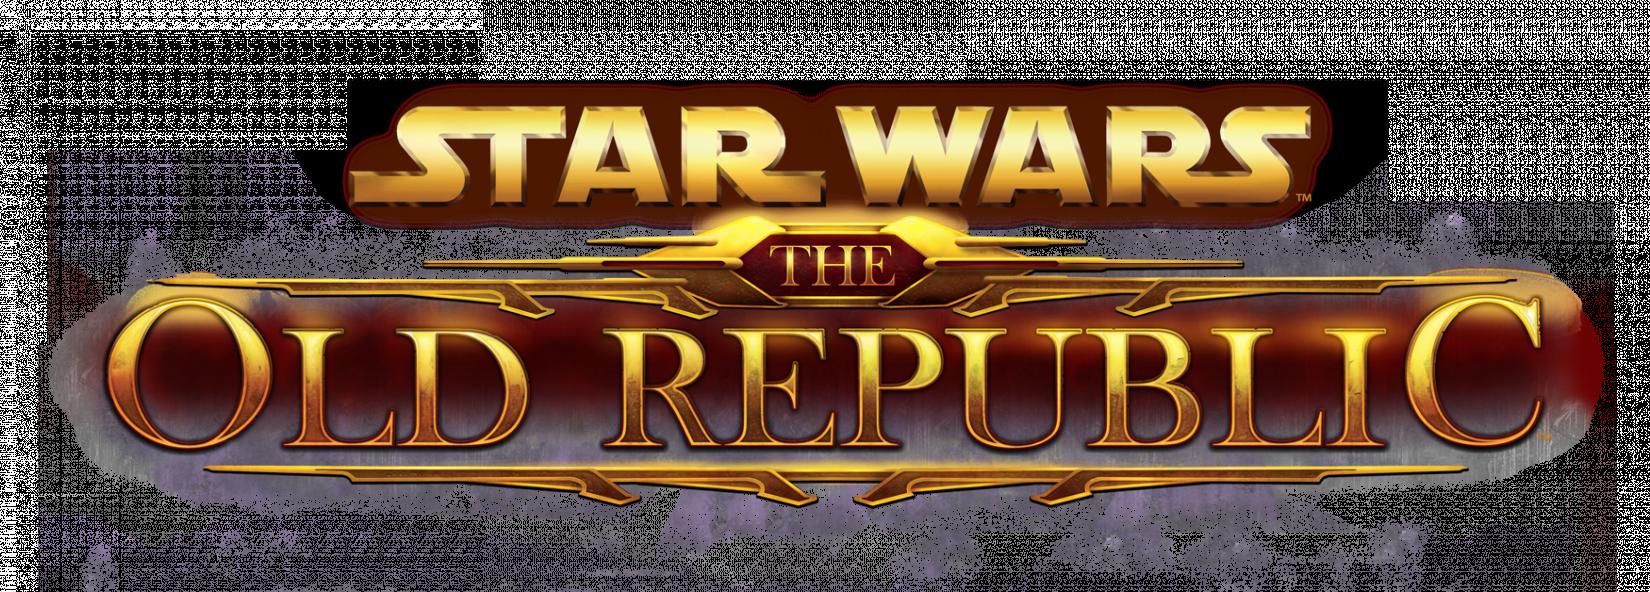 Star wars the old republic forum - Republic star wars logo ...